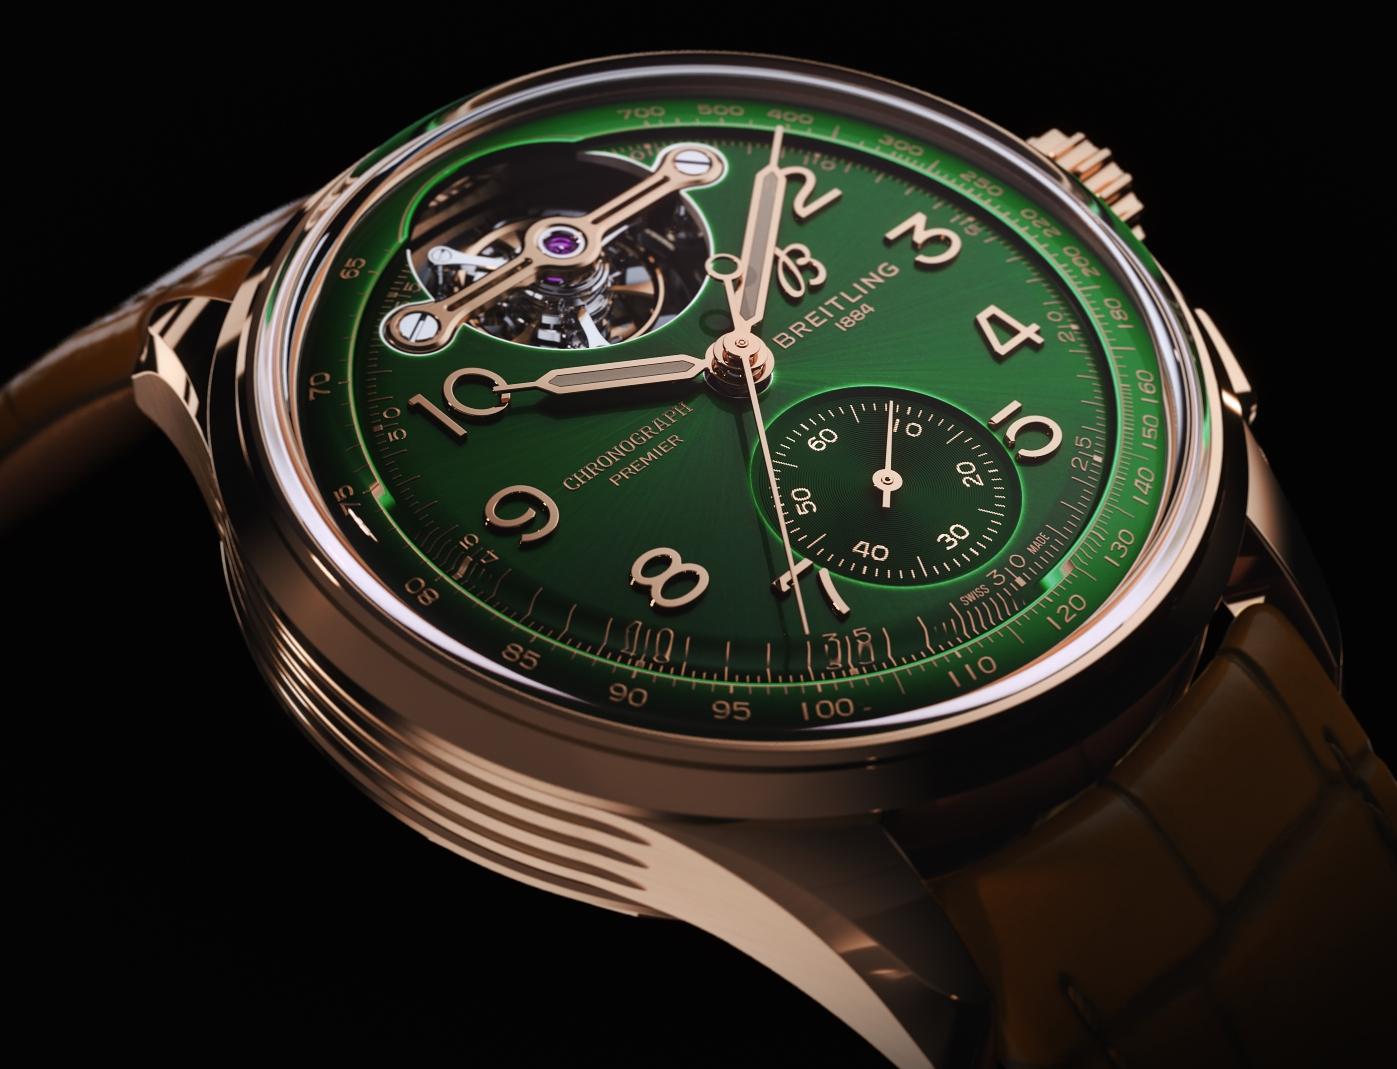 Premier B21 Chronograph Tourbillon 42 Bentley Limited Edition 5 1 1